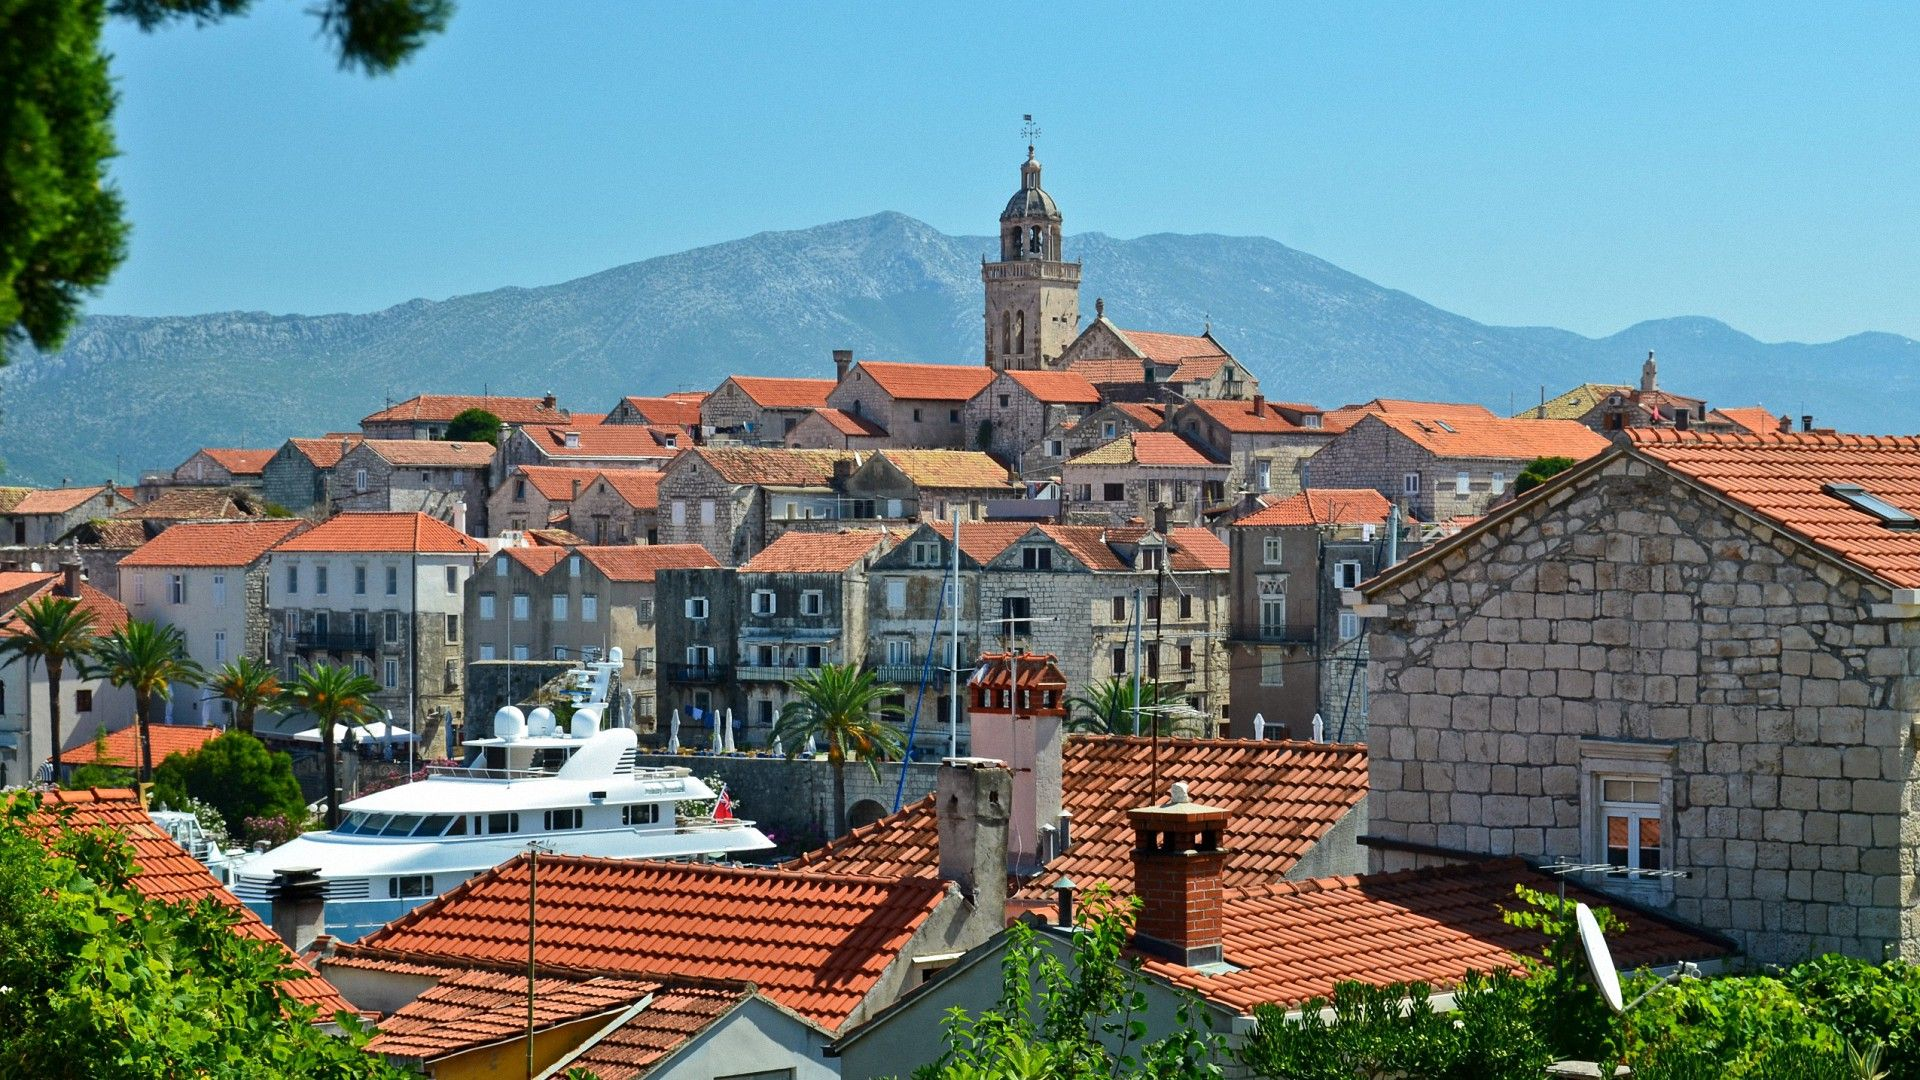 Croatia picture image